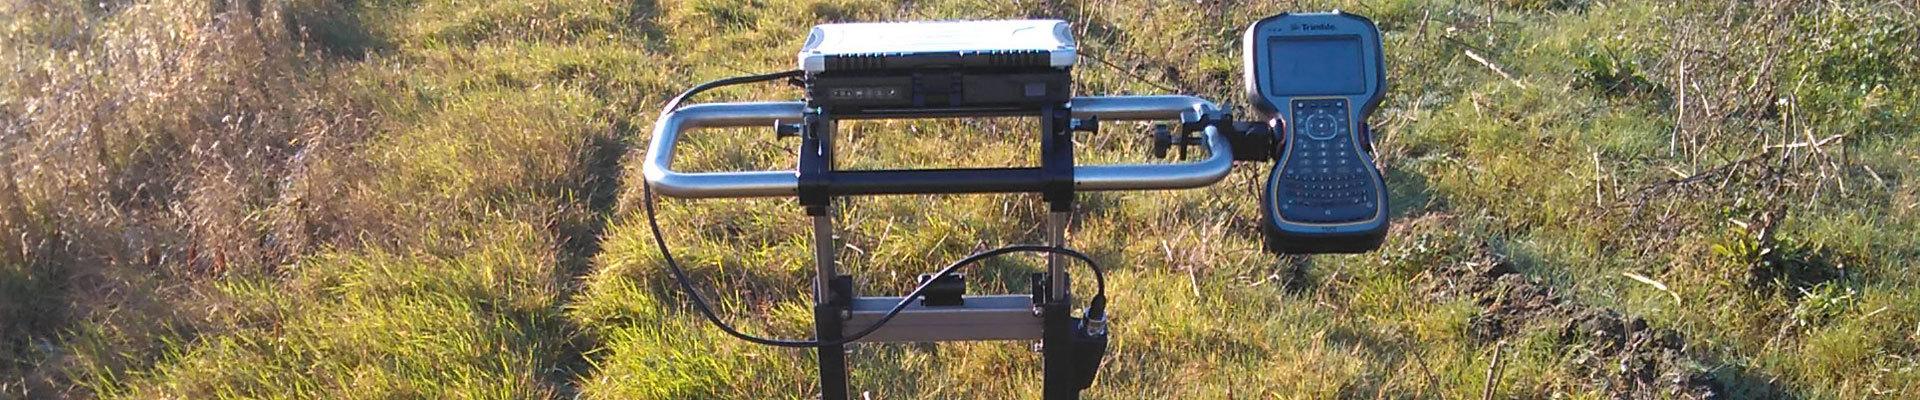 GPR & Utility